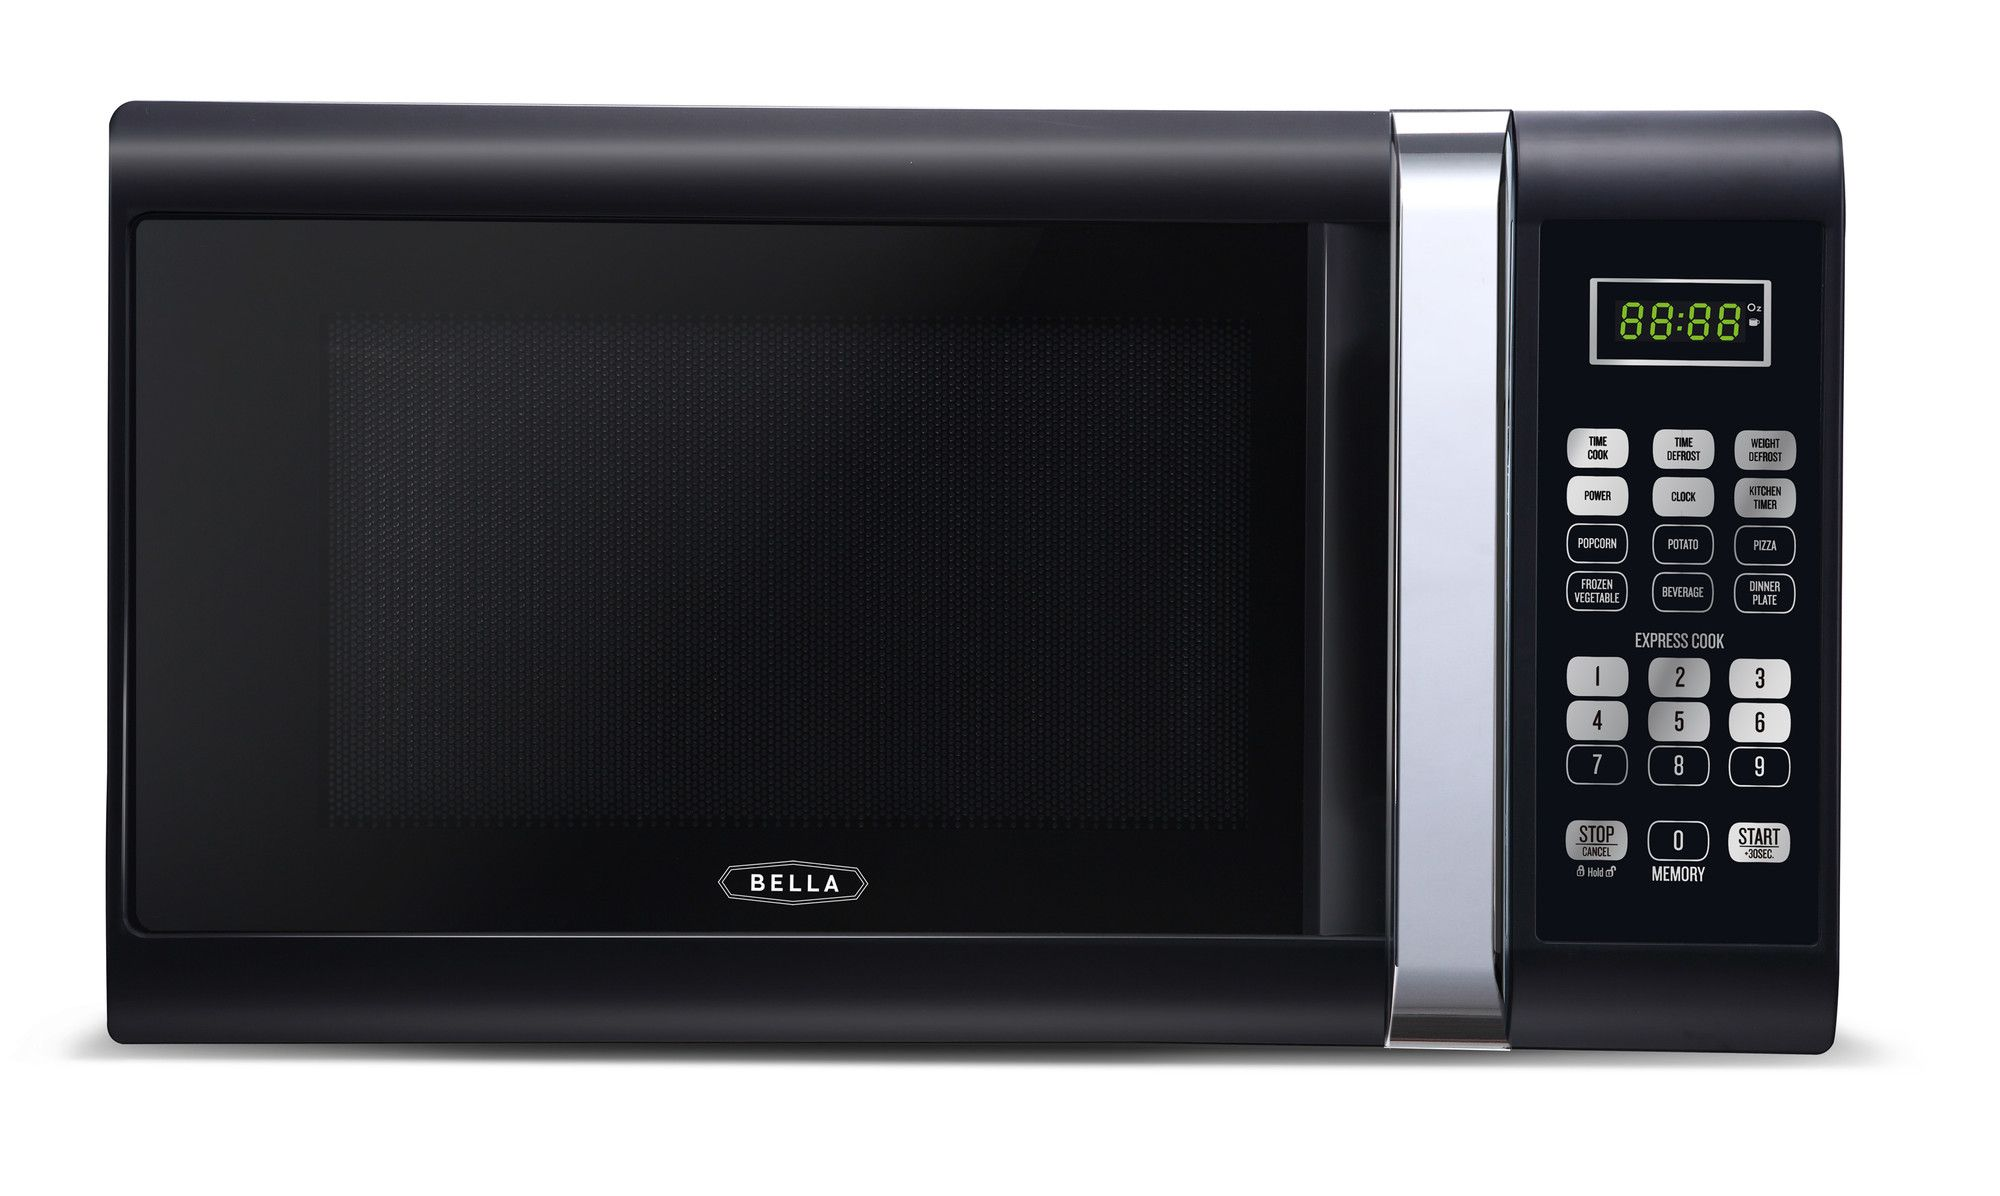 1 1 Cu Ft 1000w Countertop Microwave Countertop Microwave Microwave Oven Microwave